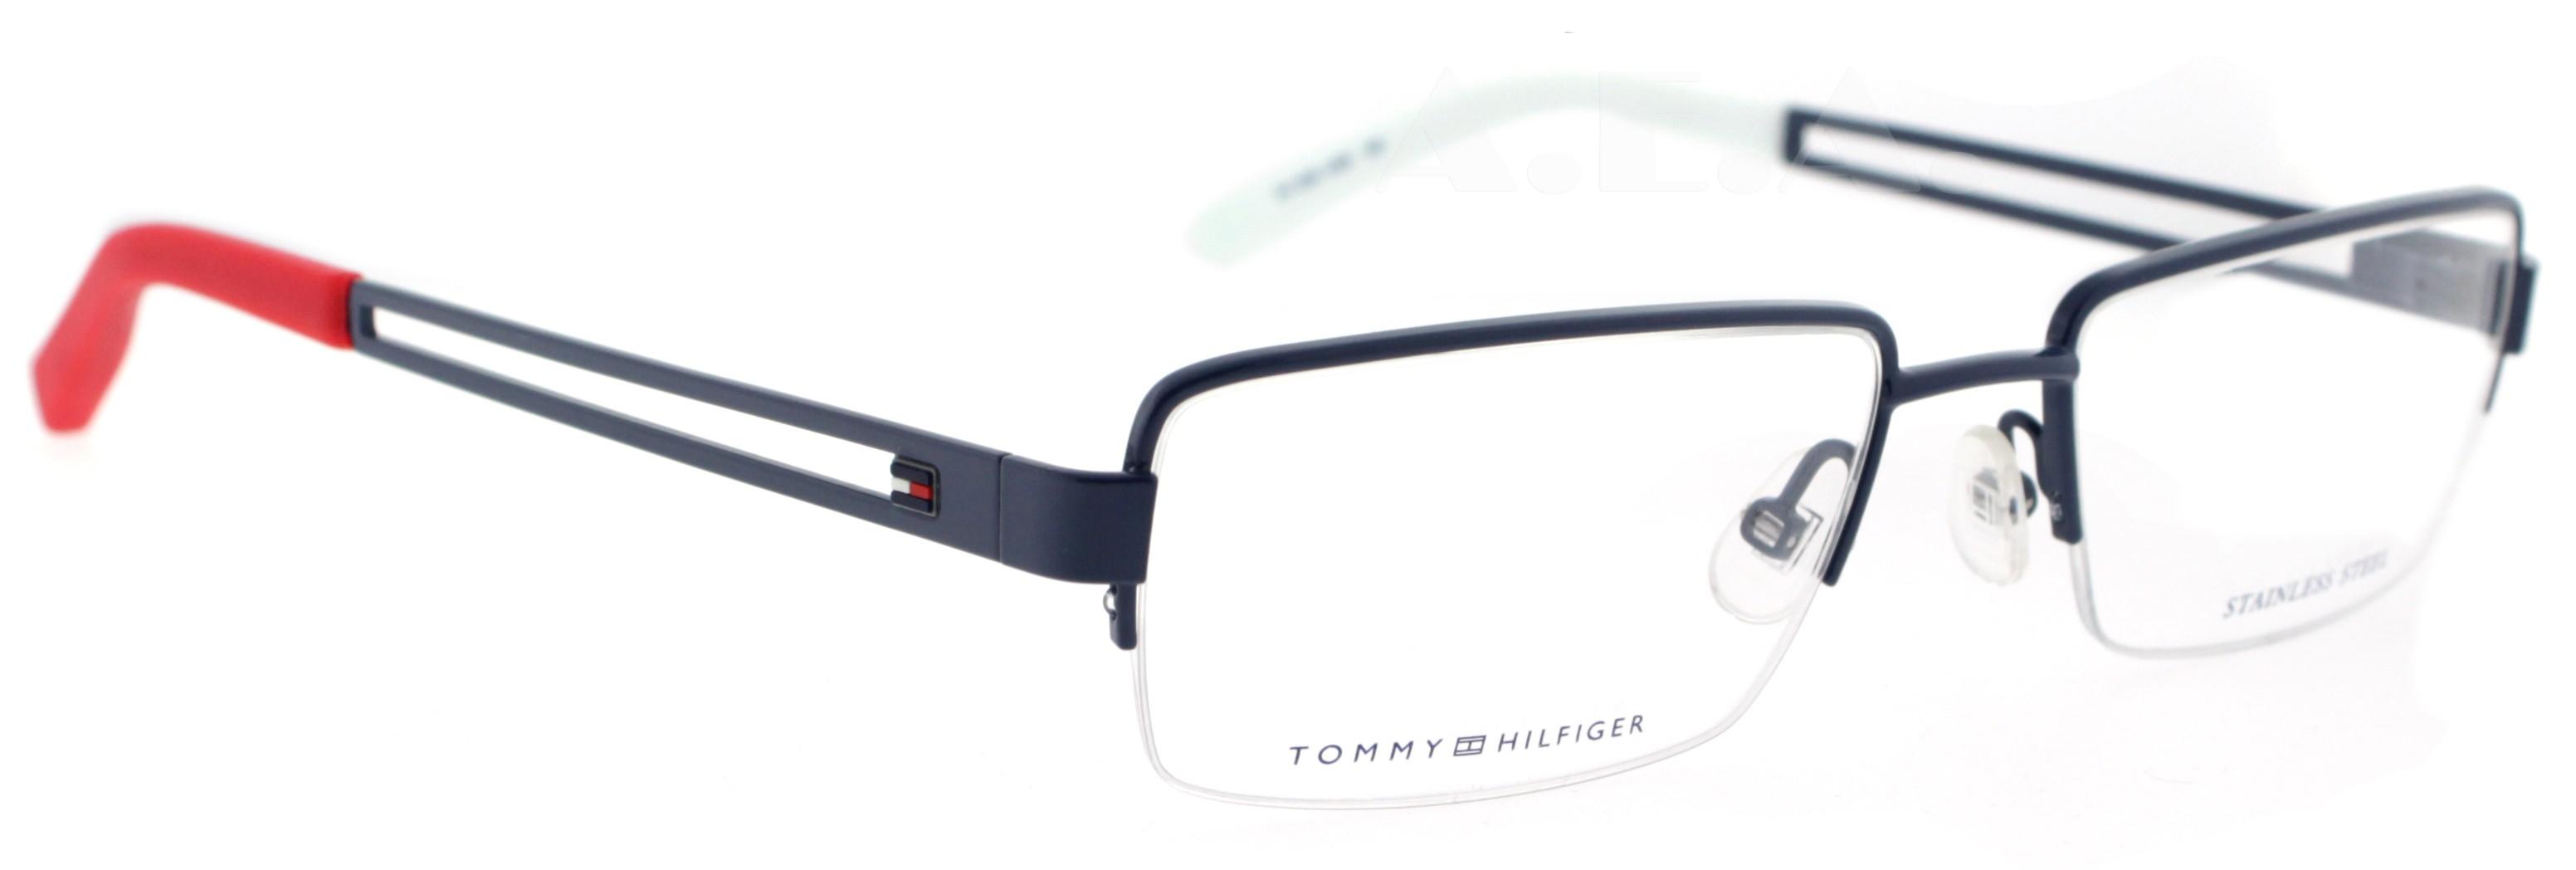 White Designer Eyeglass Frames : TOMMY HILFIGER TH 1024 UNX BLUE/RED/WHITE UNISEX DESIGNER ...